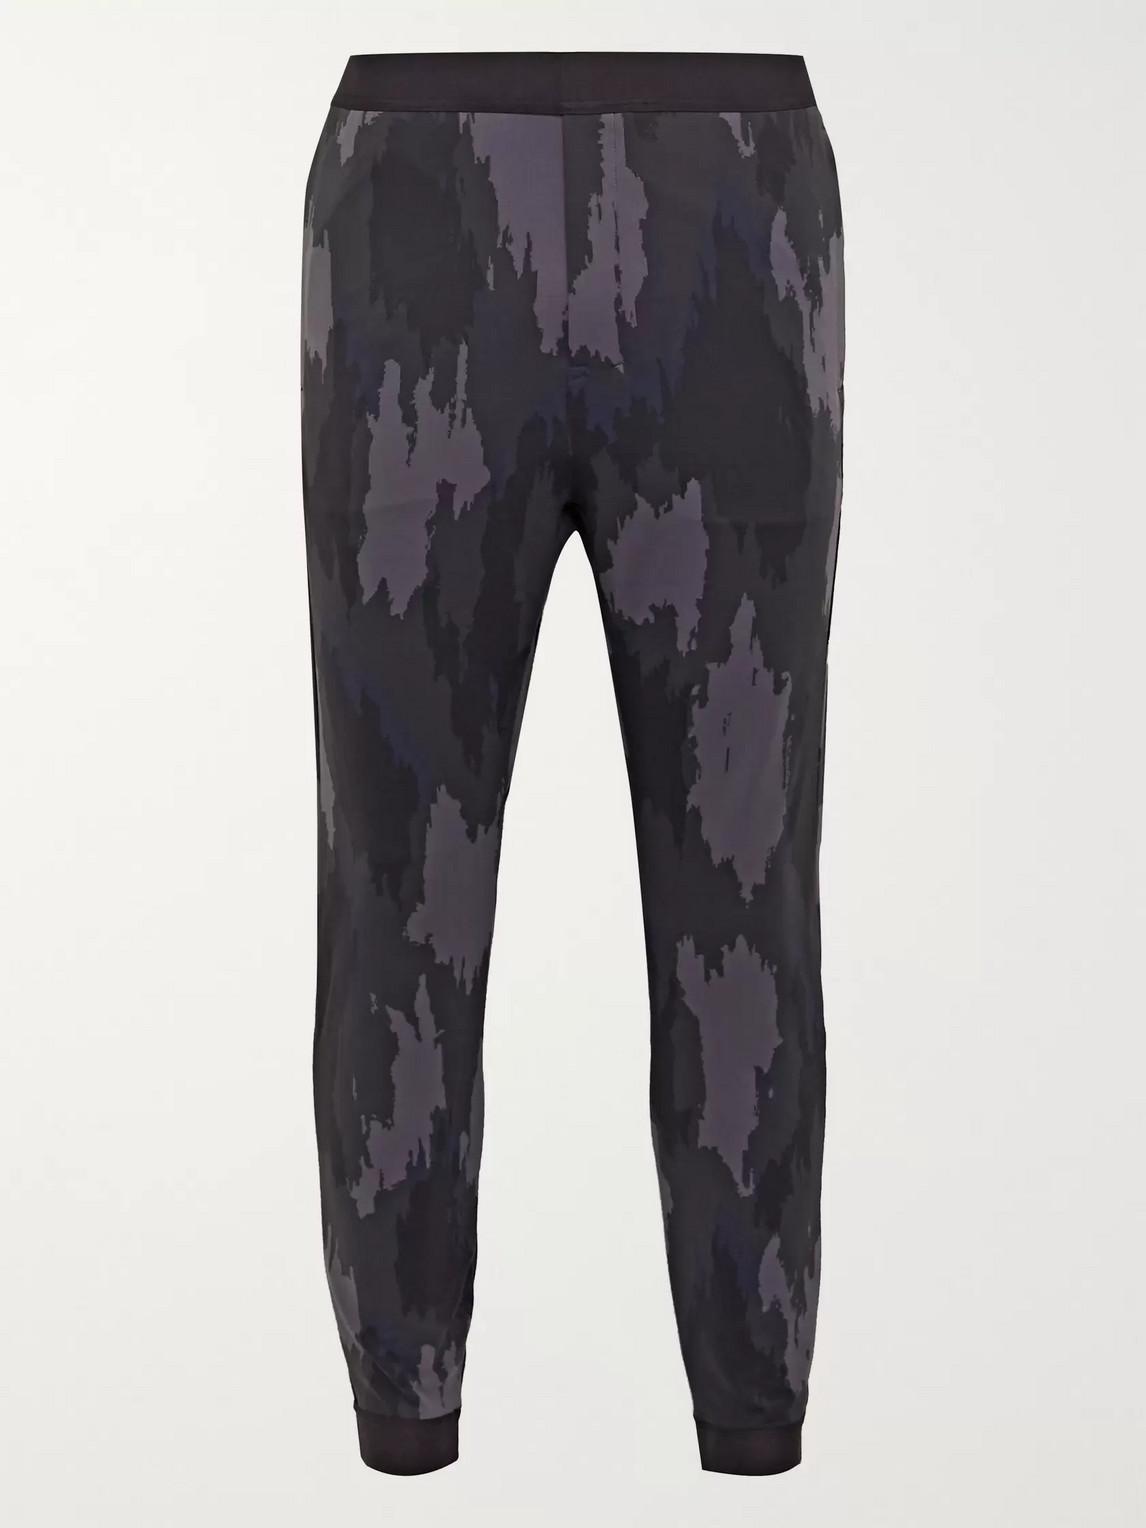 lululemon - robert geller take the moment slim-fit tapered printed full-on luon sweatpants - men - gray